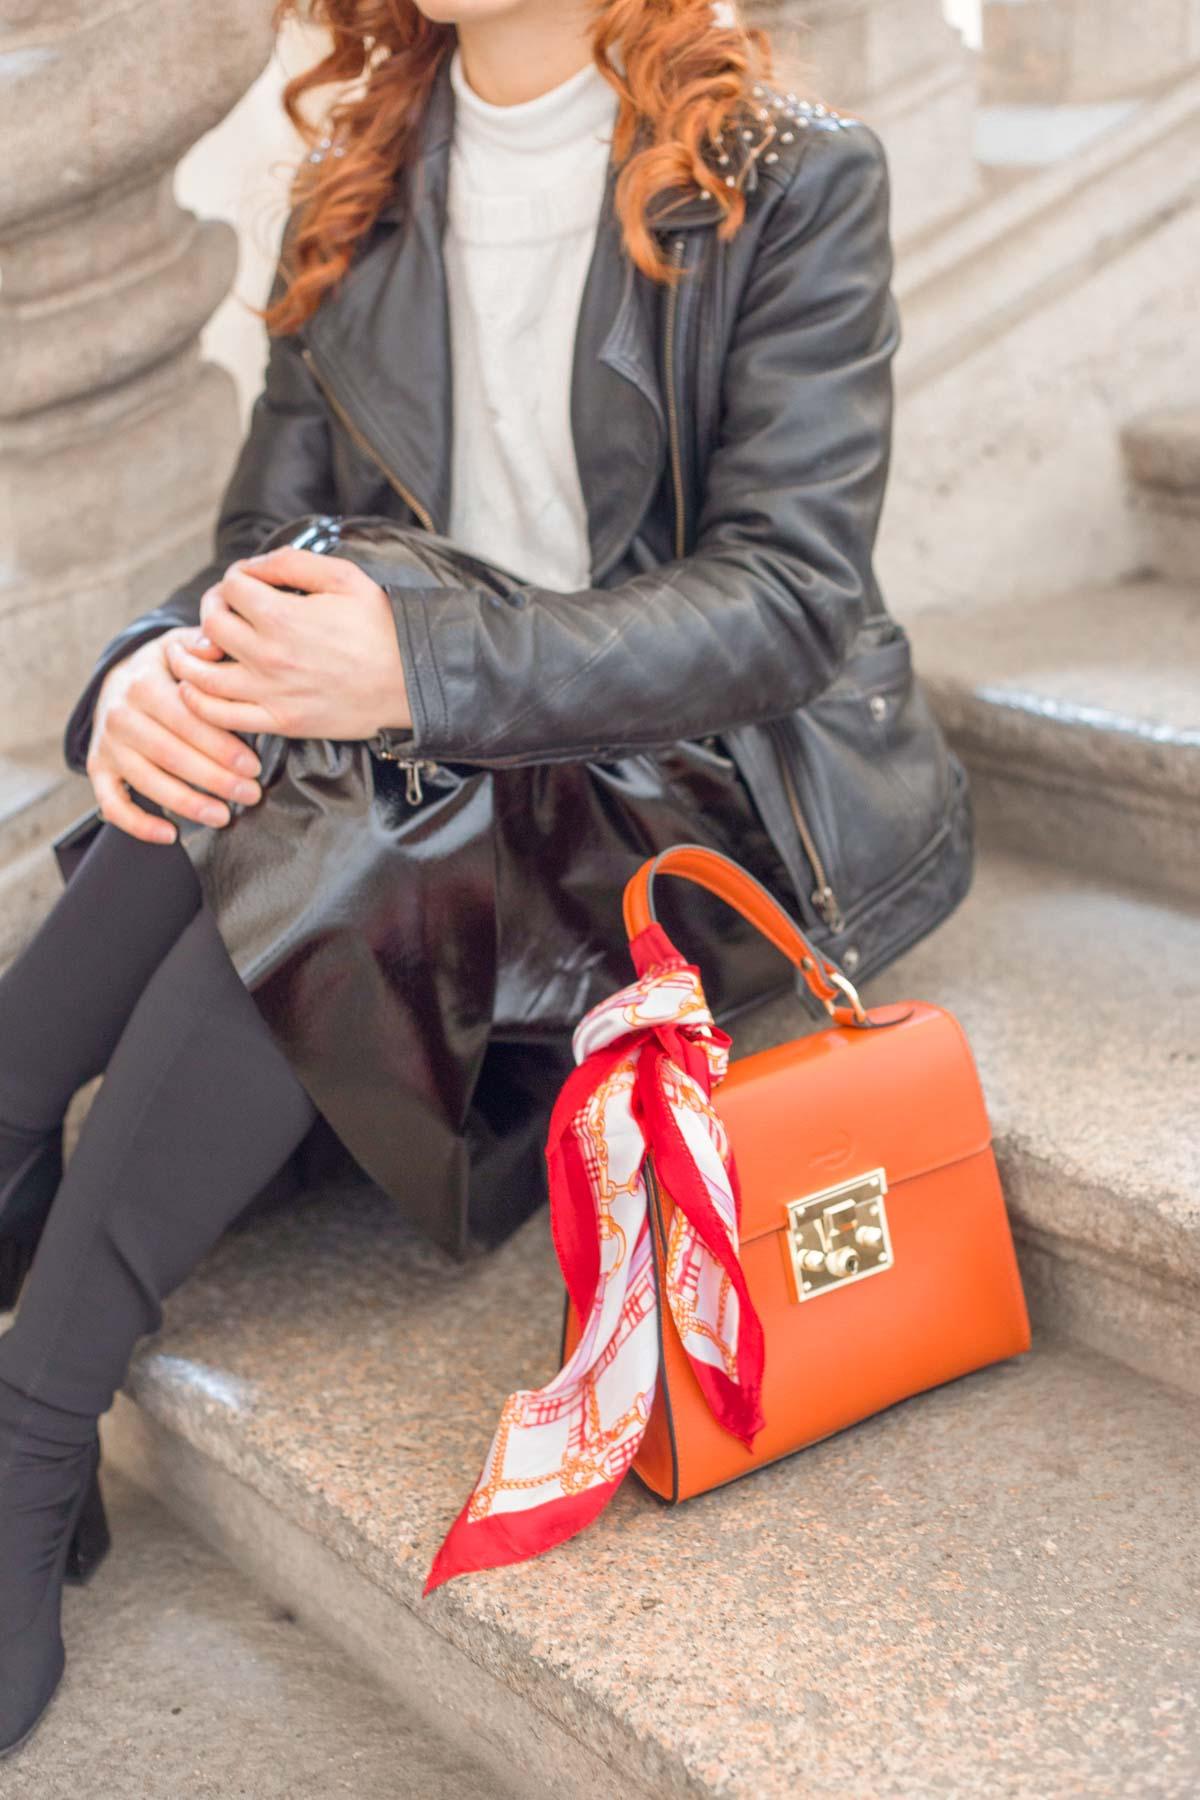 borsa monnaluna arancione